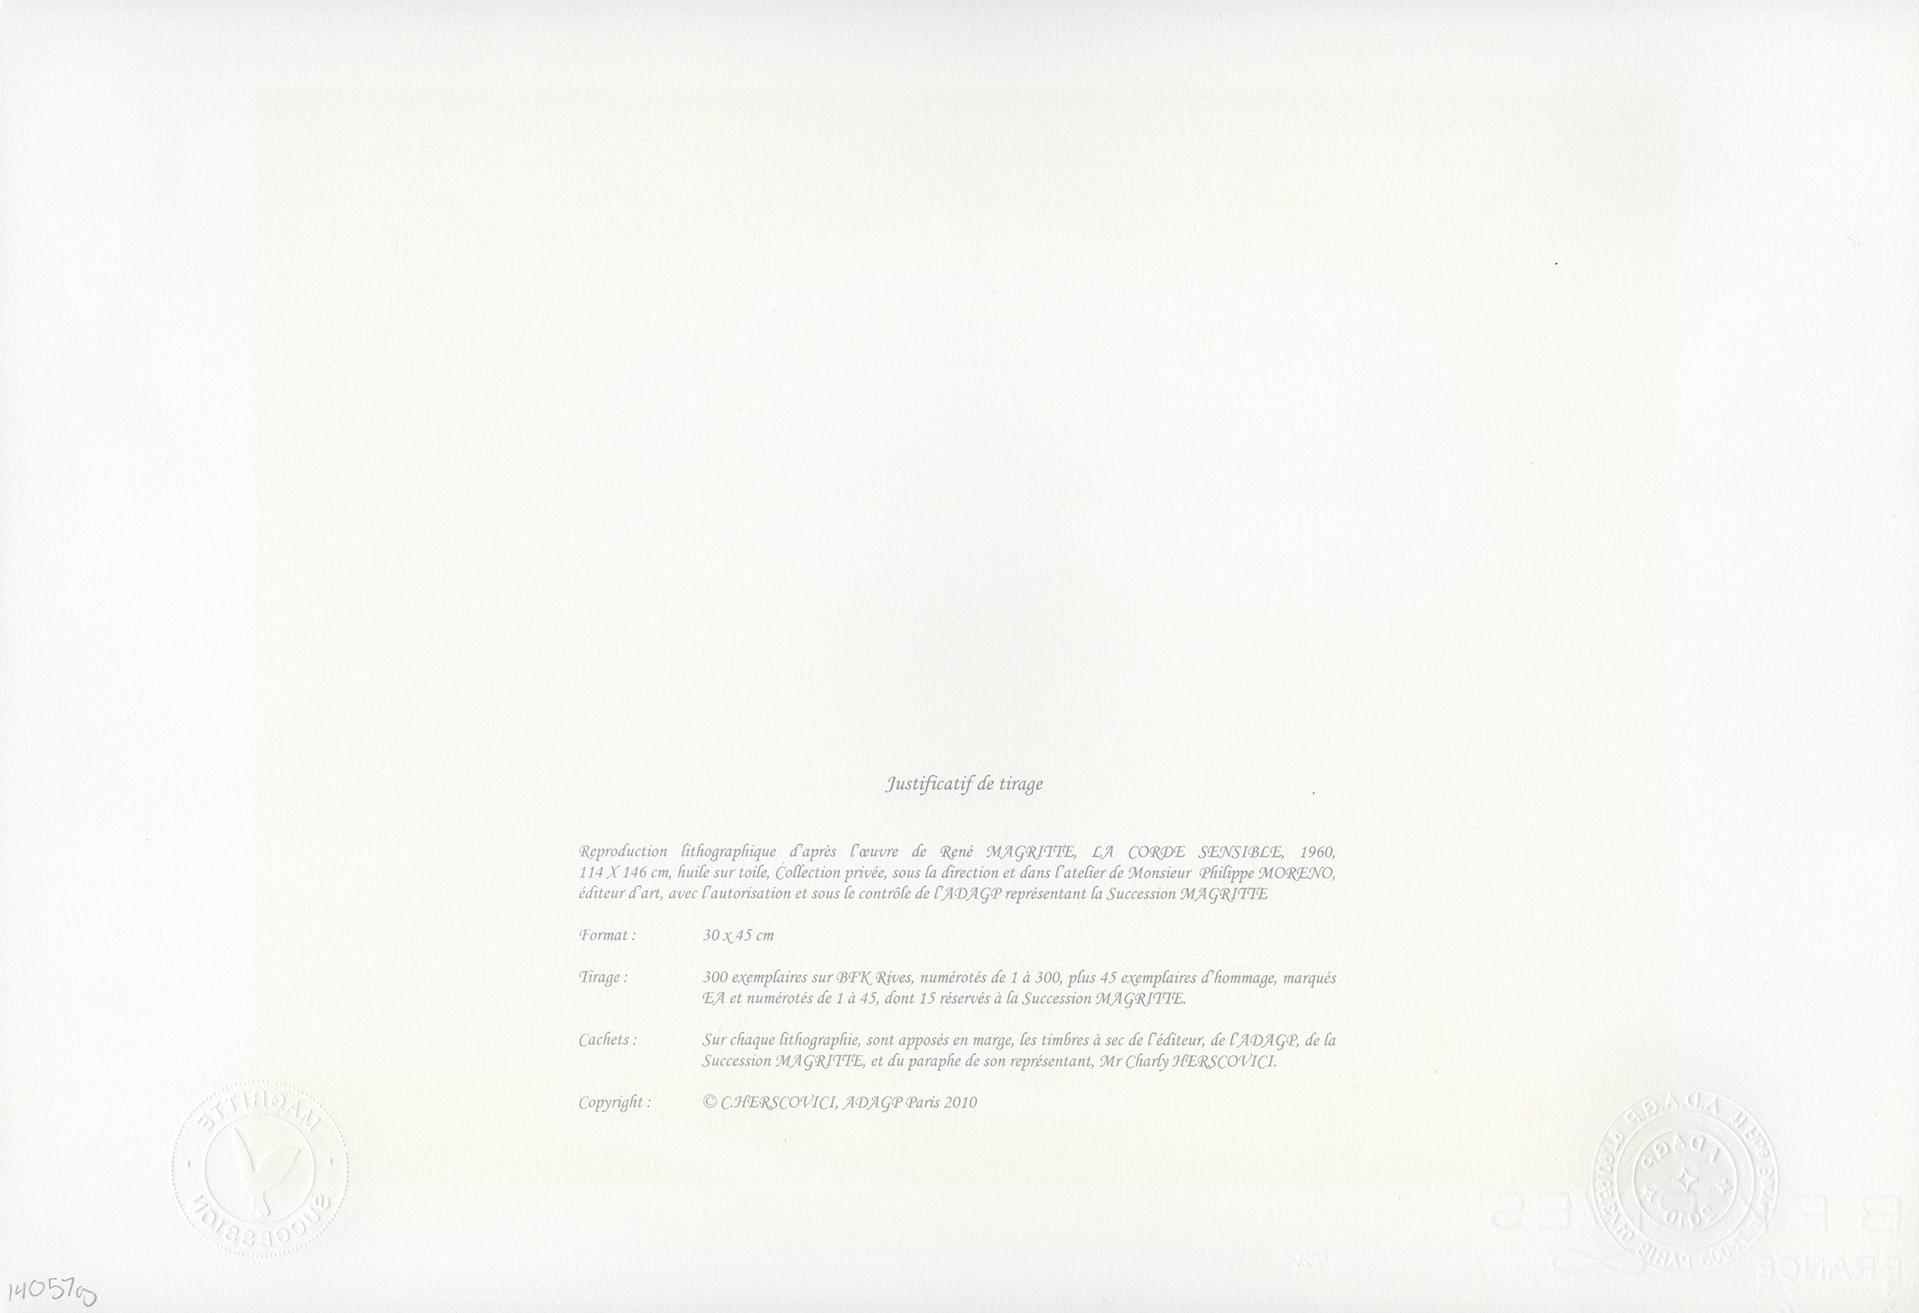 La Corde Sensible (Heartstring) by Rene Magritte